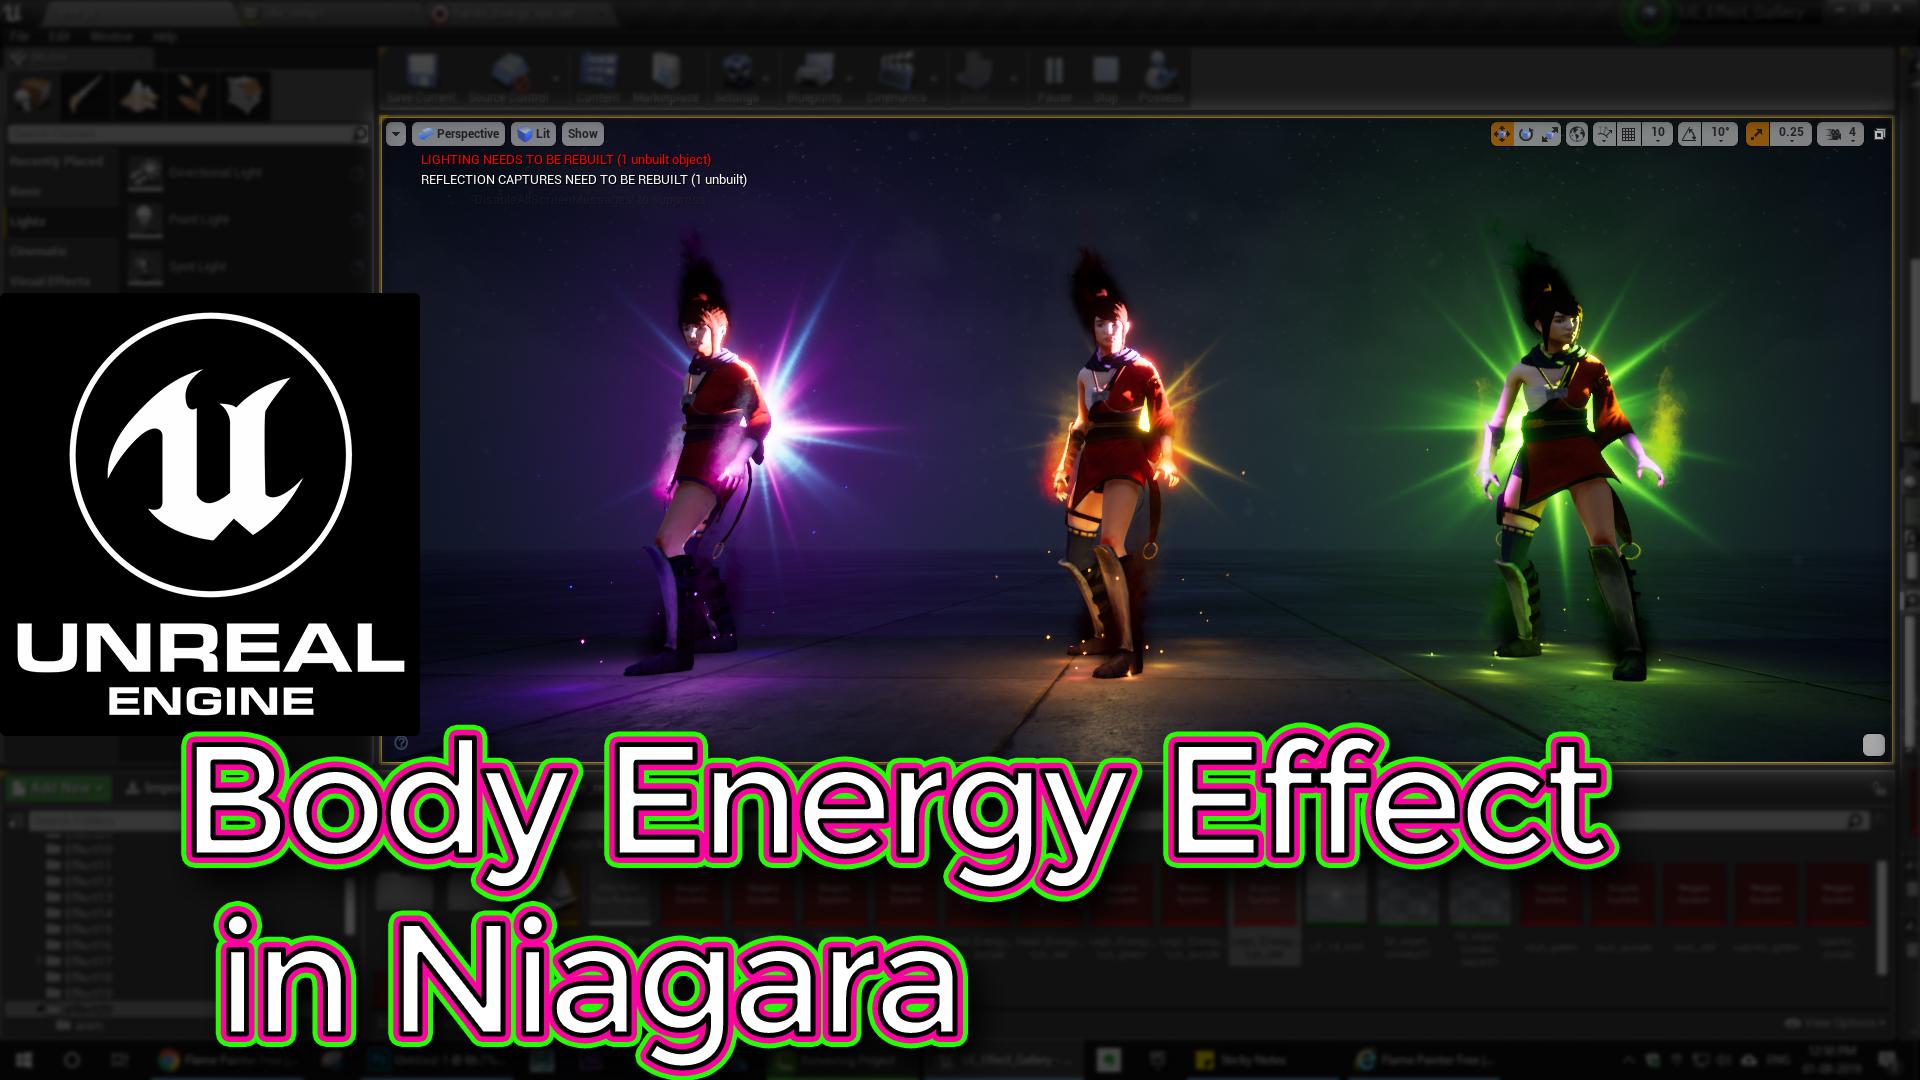 Unreal Engine Body Energy Effect in Niagara Tutorials